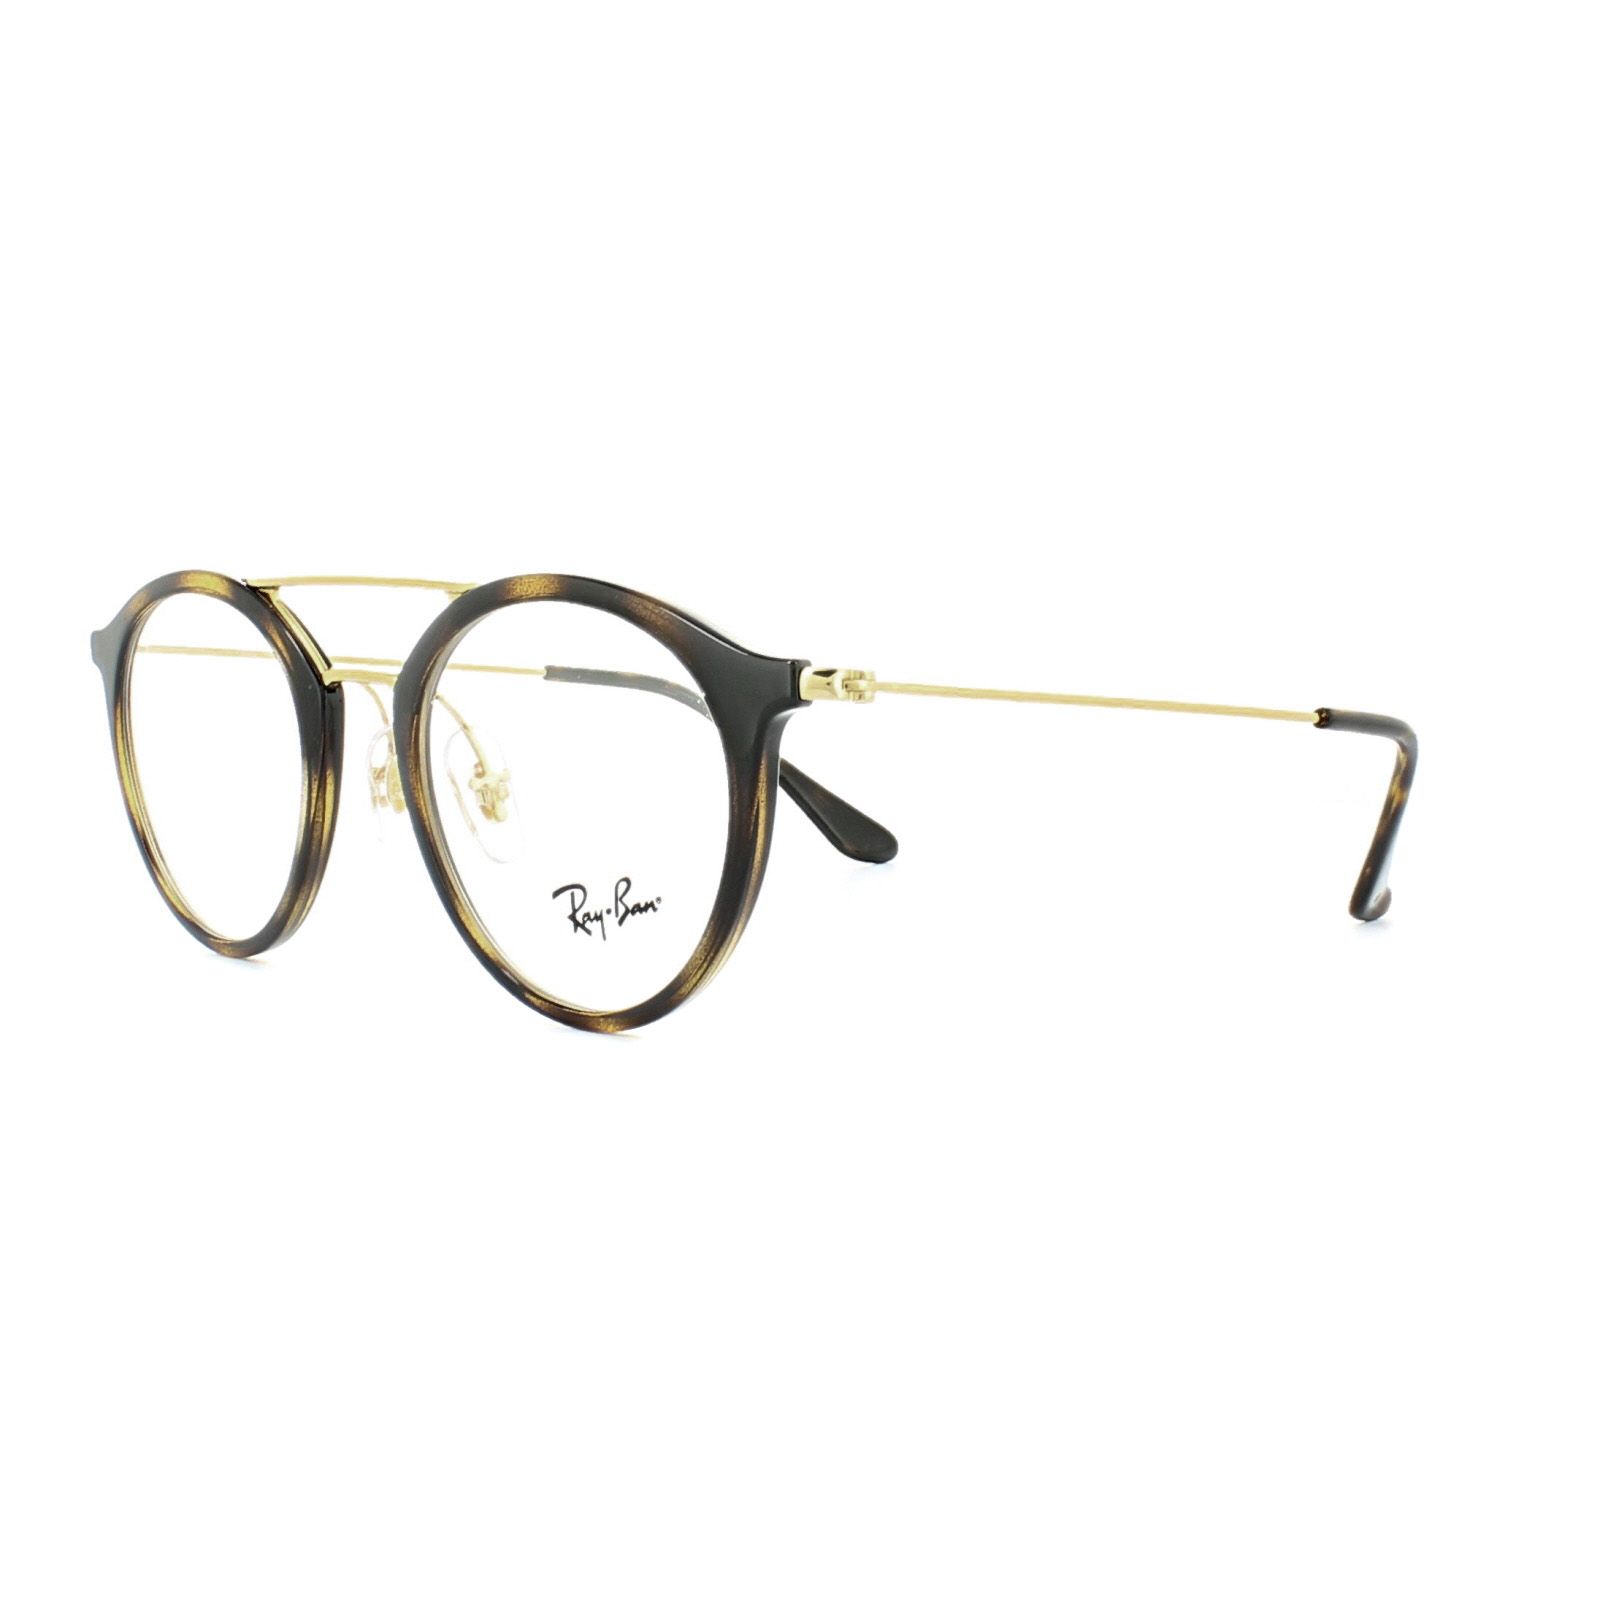 c3a20b1f423 Sentinel Ray-Ban Glasses Frames 7097 2012 Dark Tortoise 49mm Mens